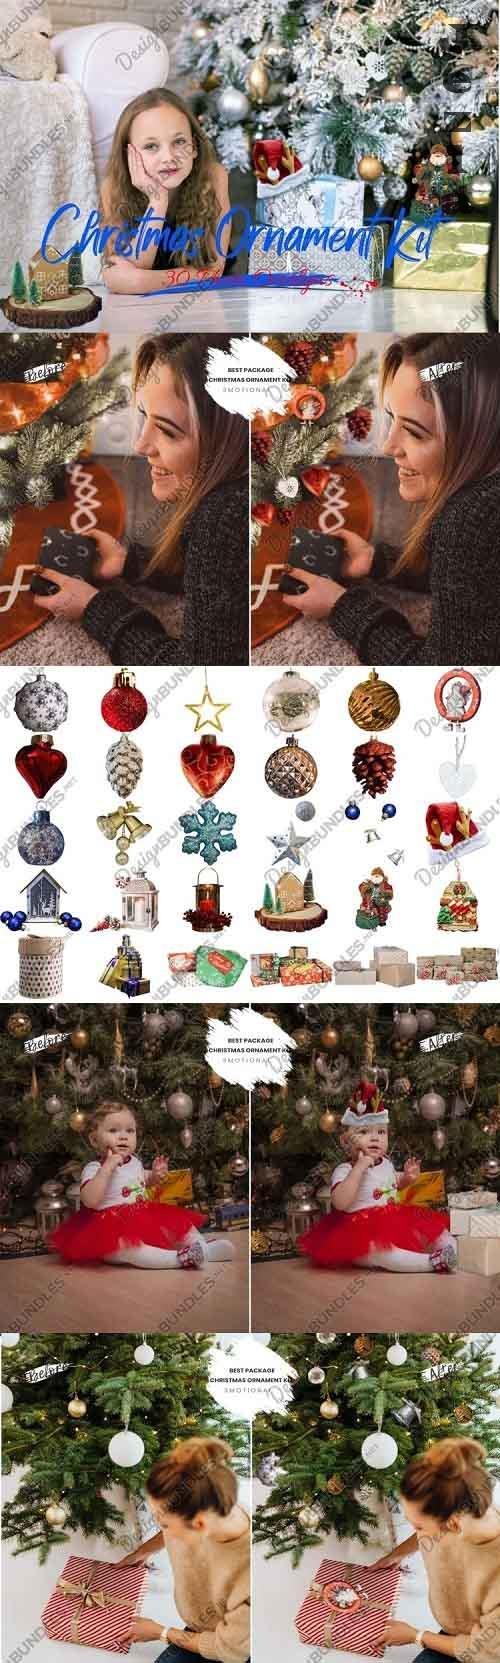 Christmas Ornament kit Photoshop Overlays - 997605